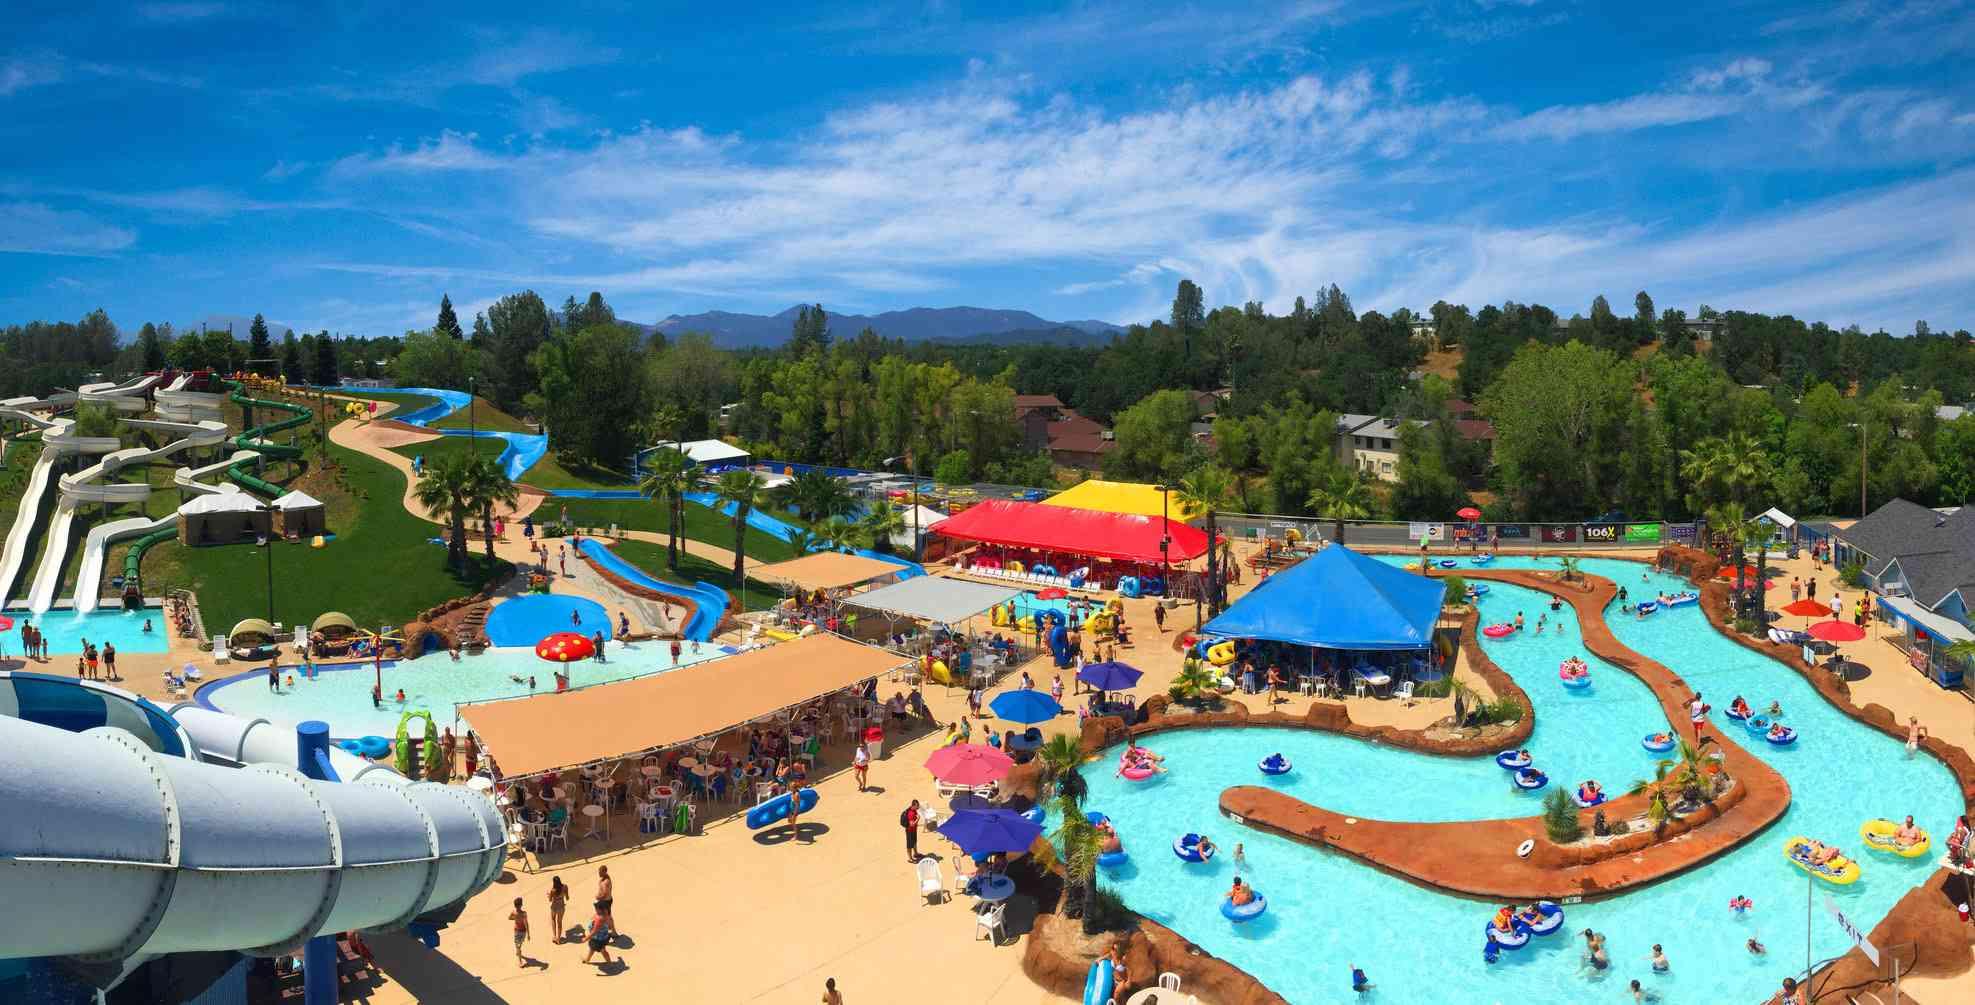 WaterWorks water park in California